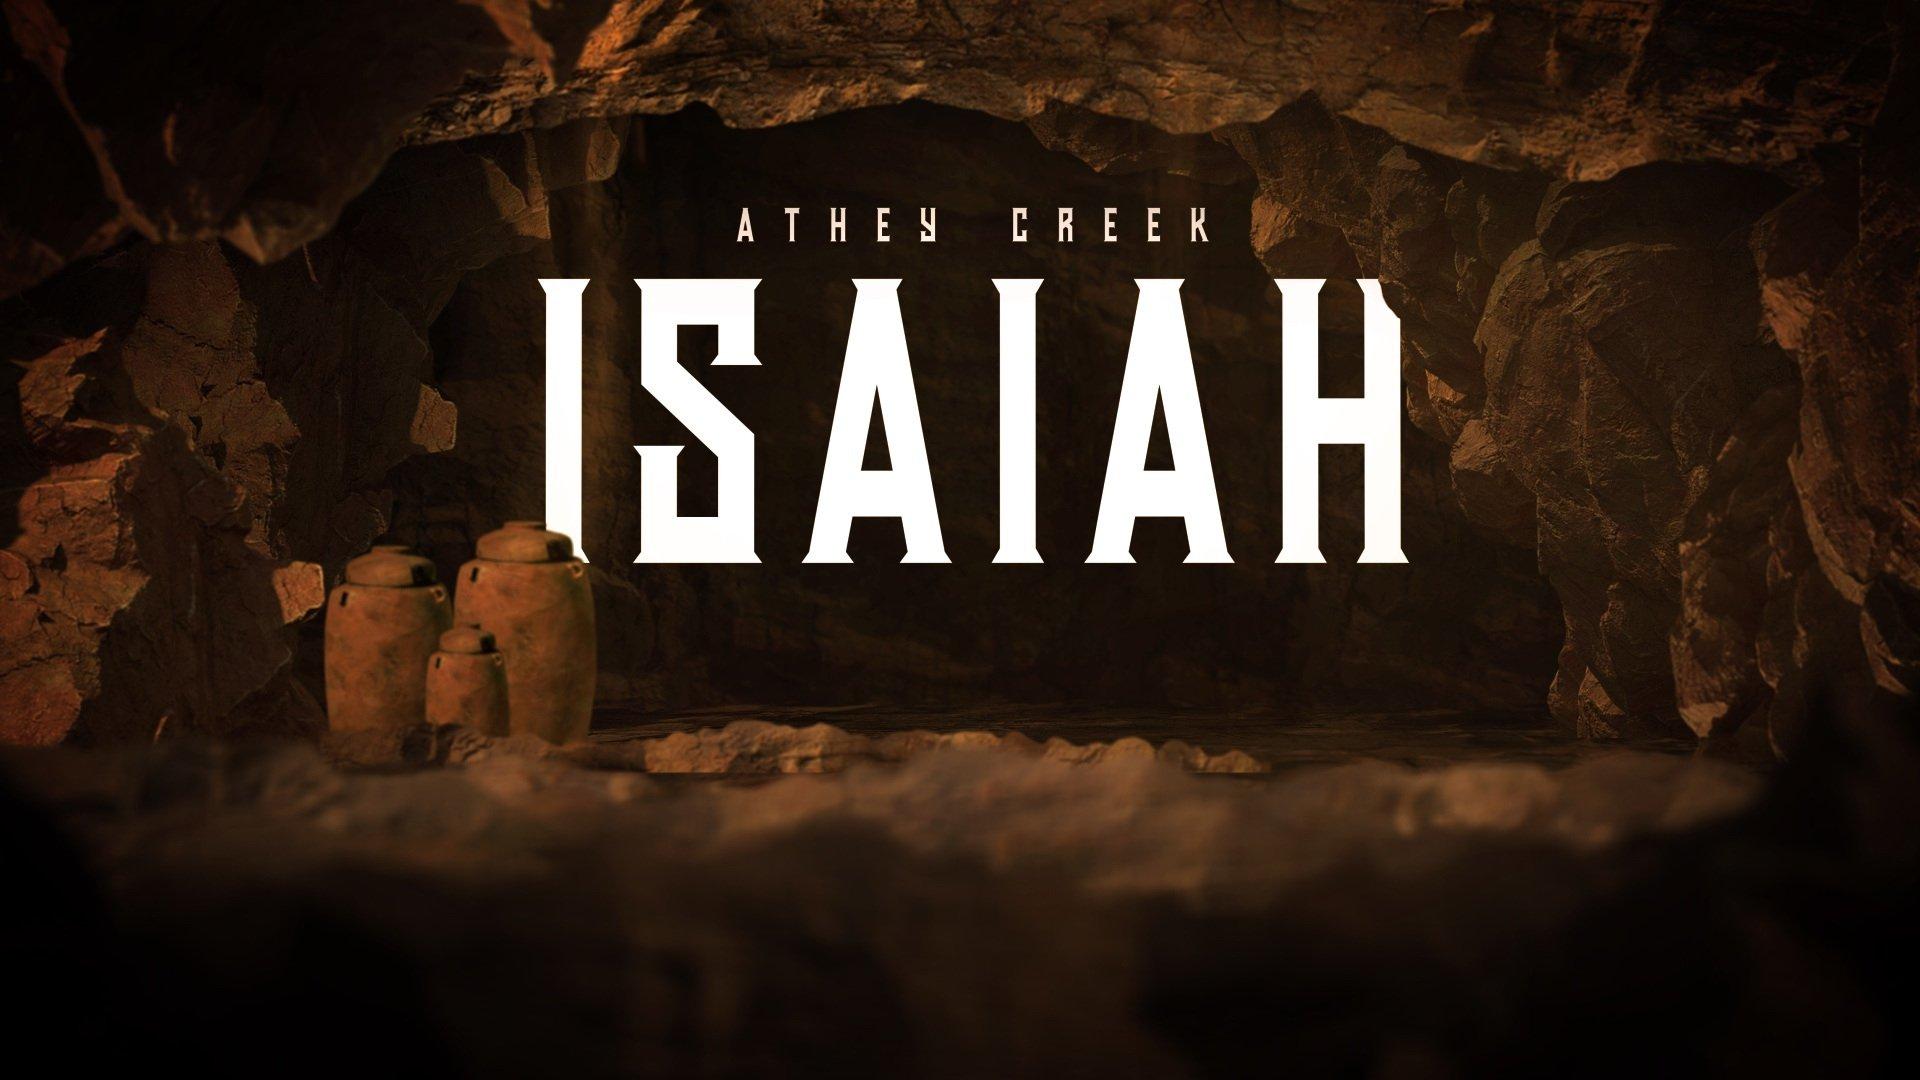 Teaching artwork for Isaiah